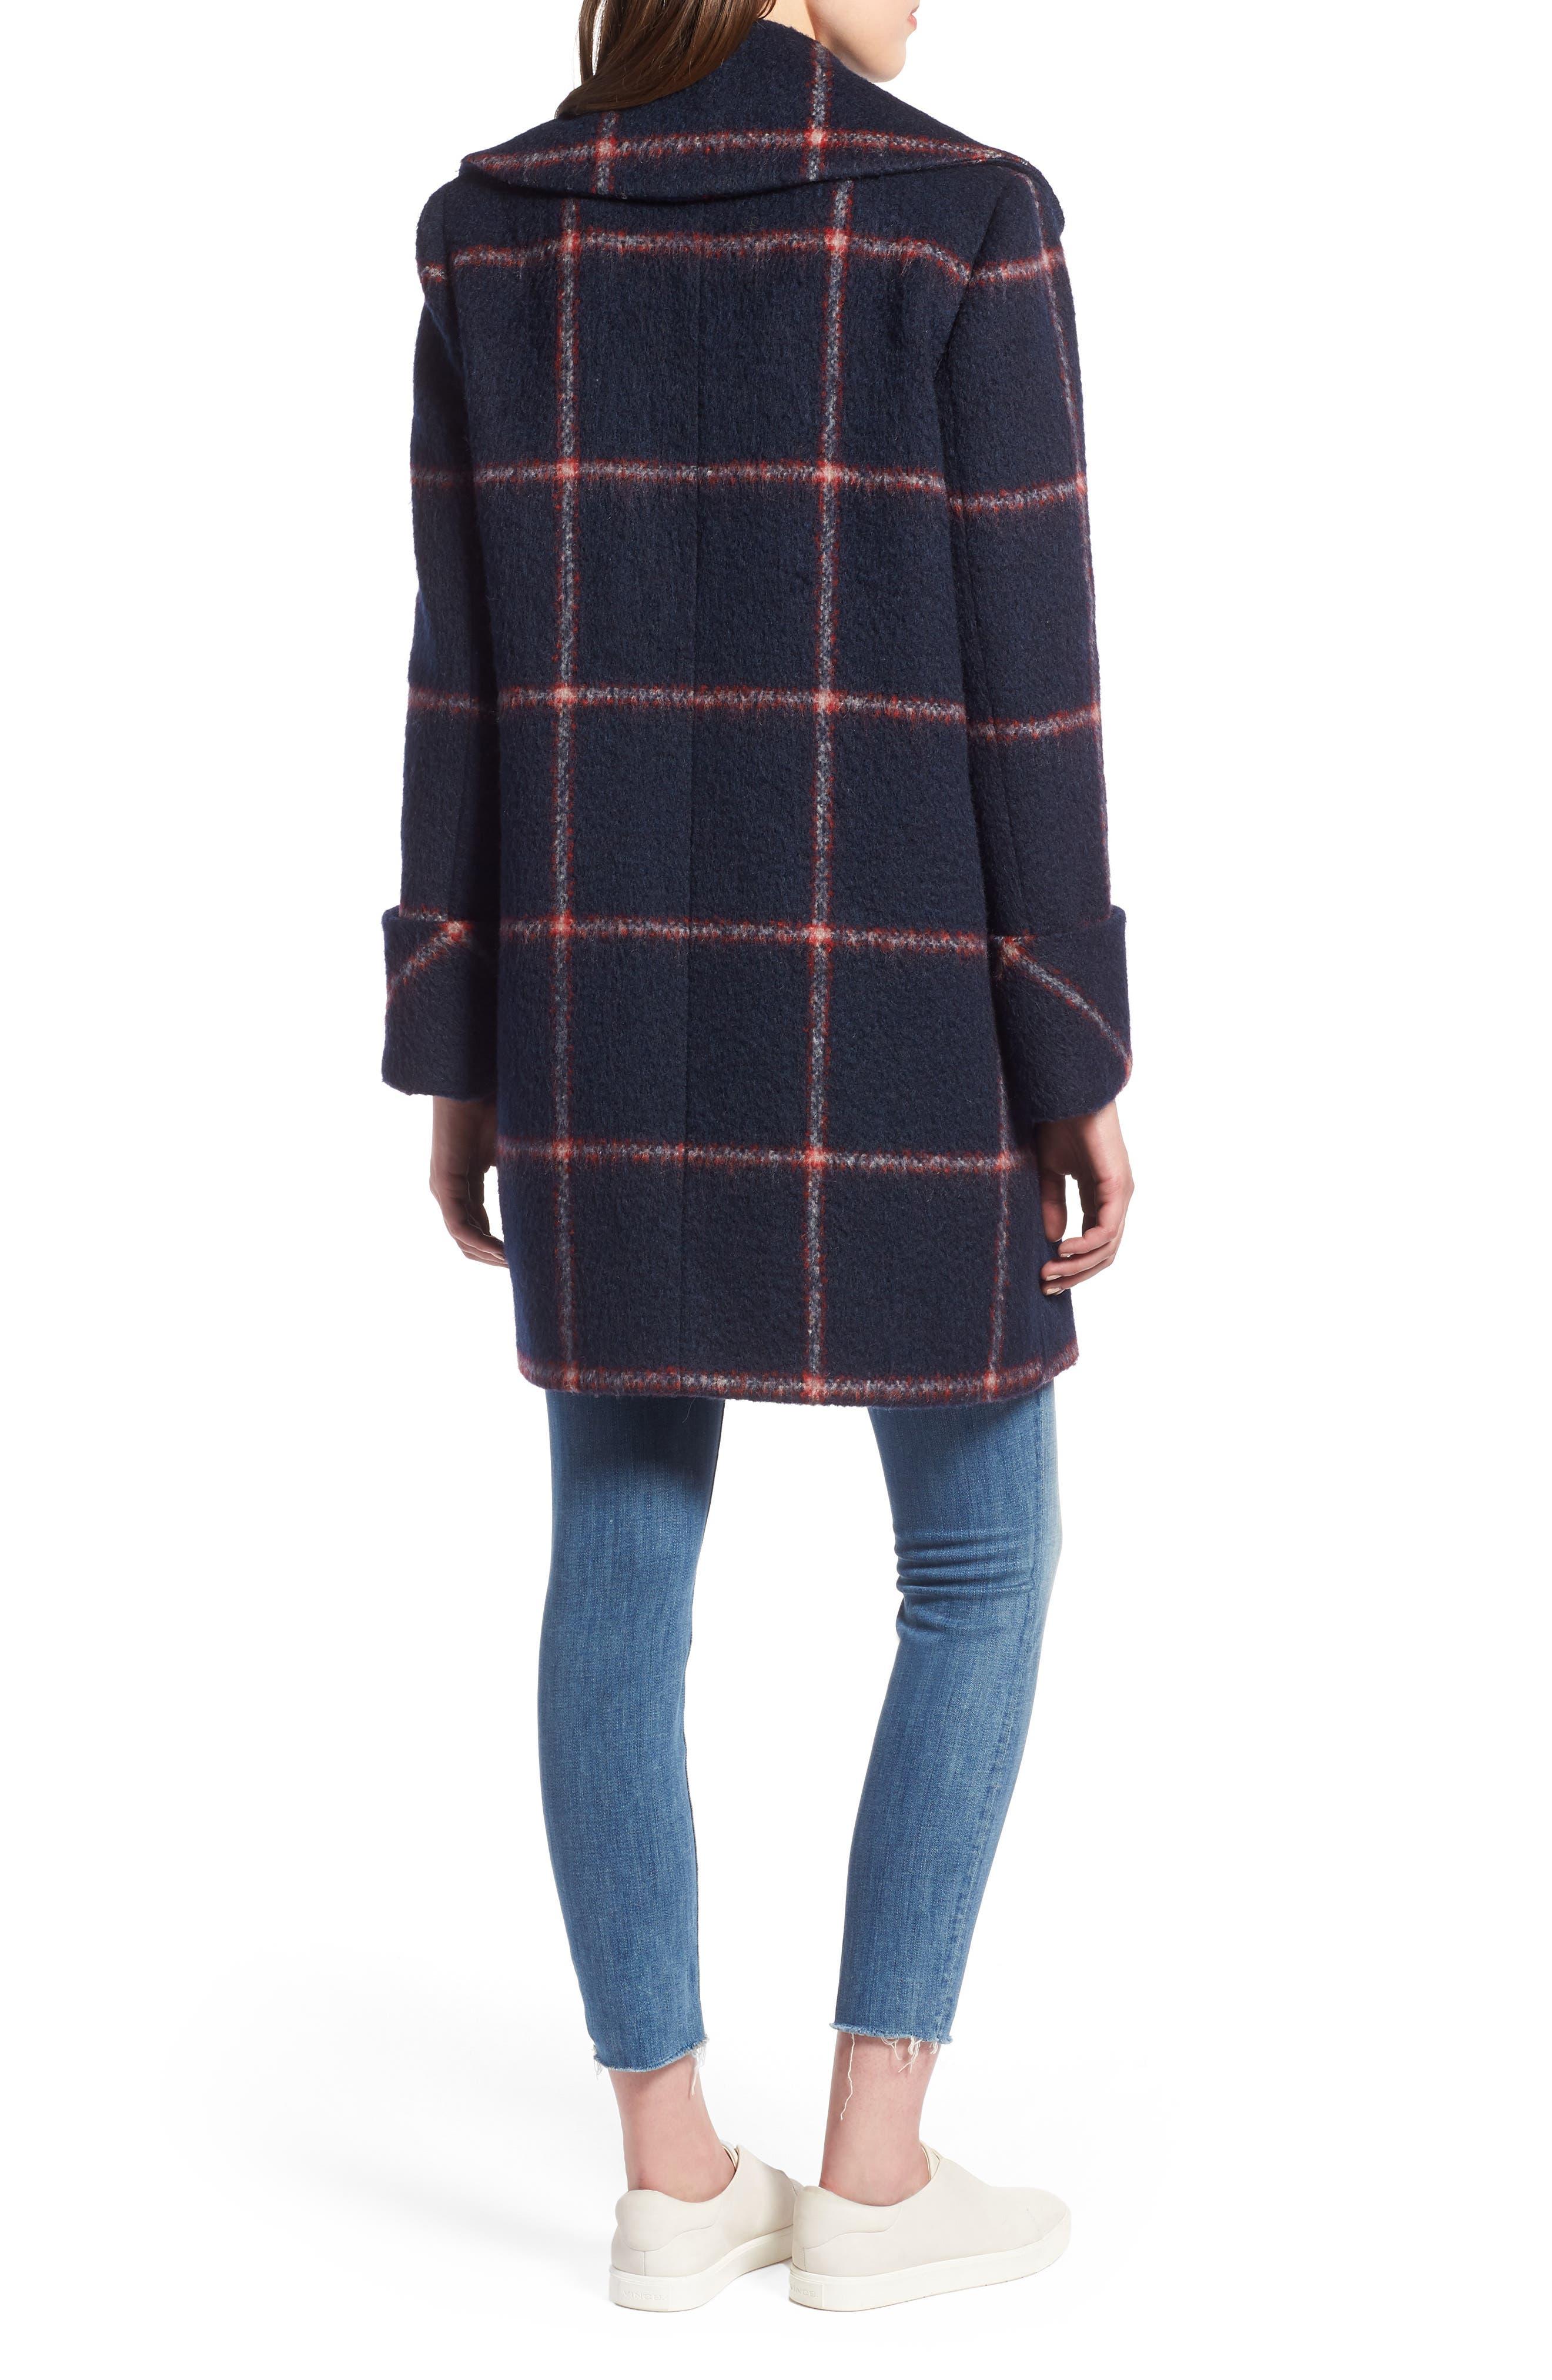 KENDALL + KYLIE, Oversize Collar Coat, Alternate thumbnail 2, color, 427